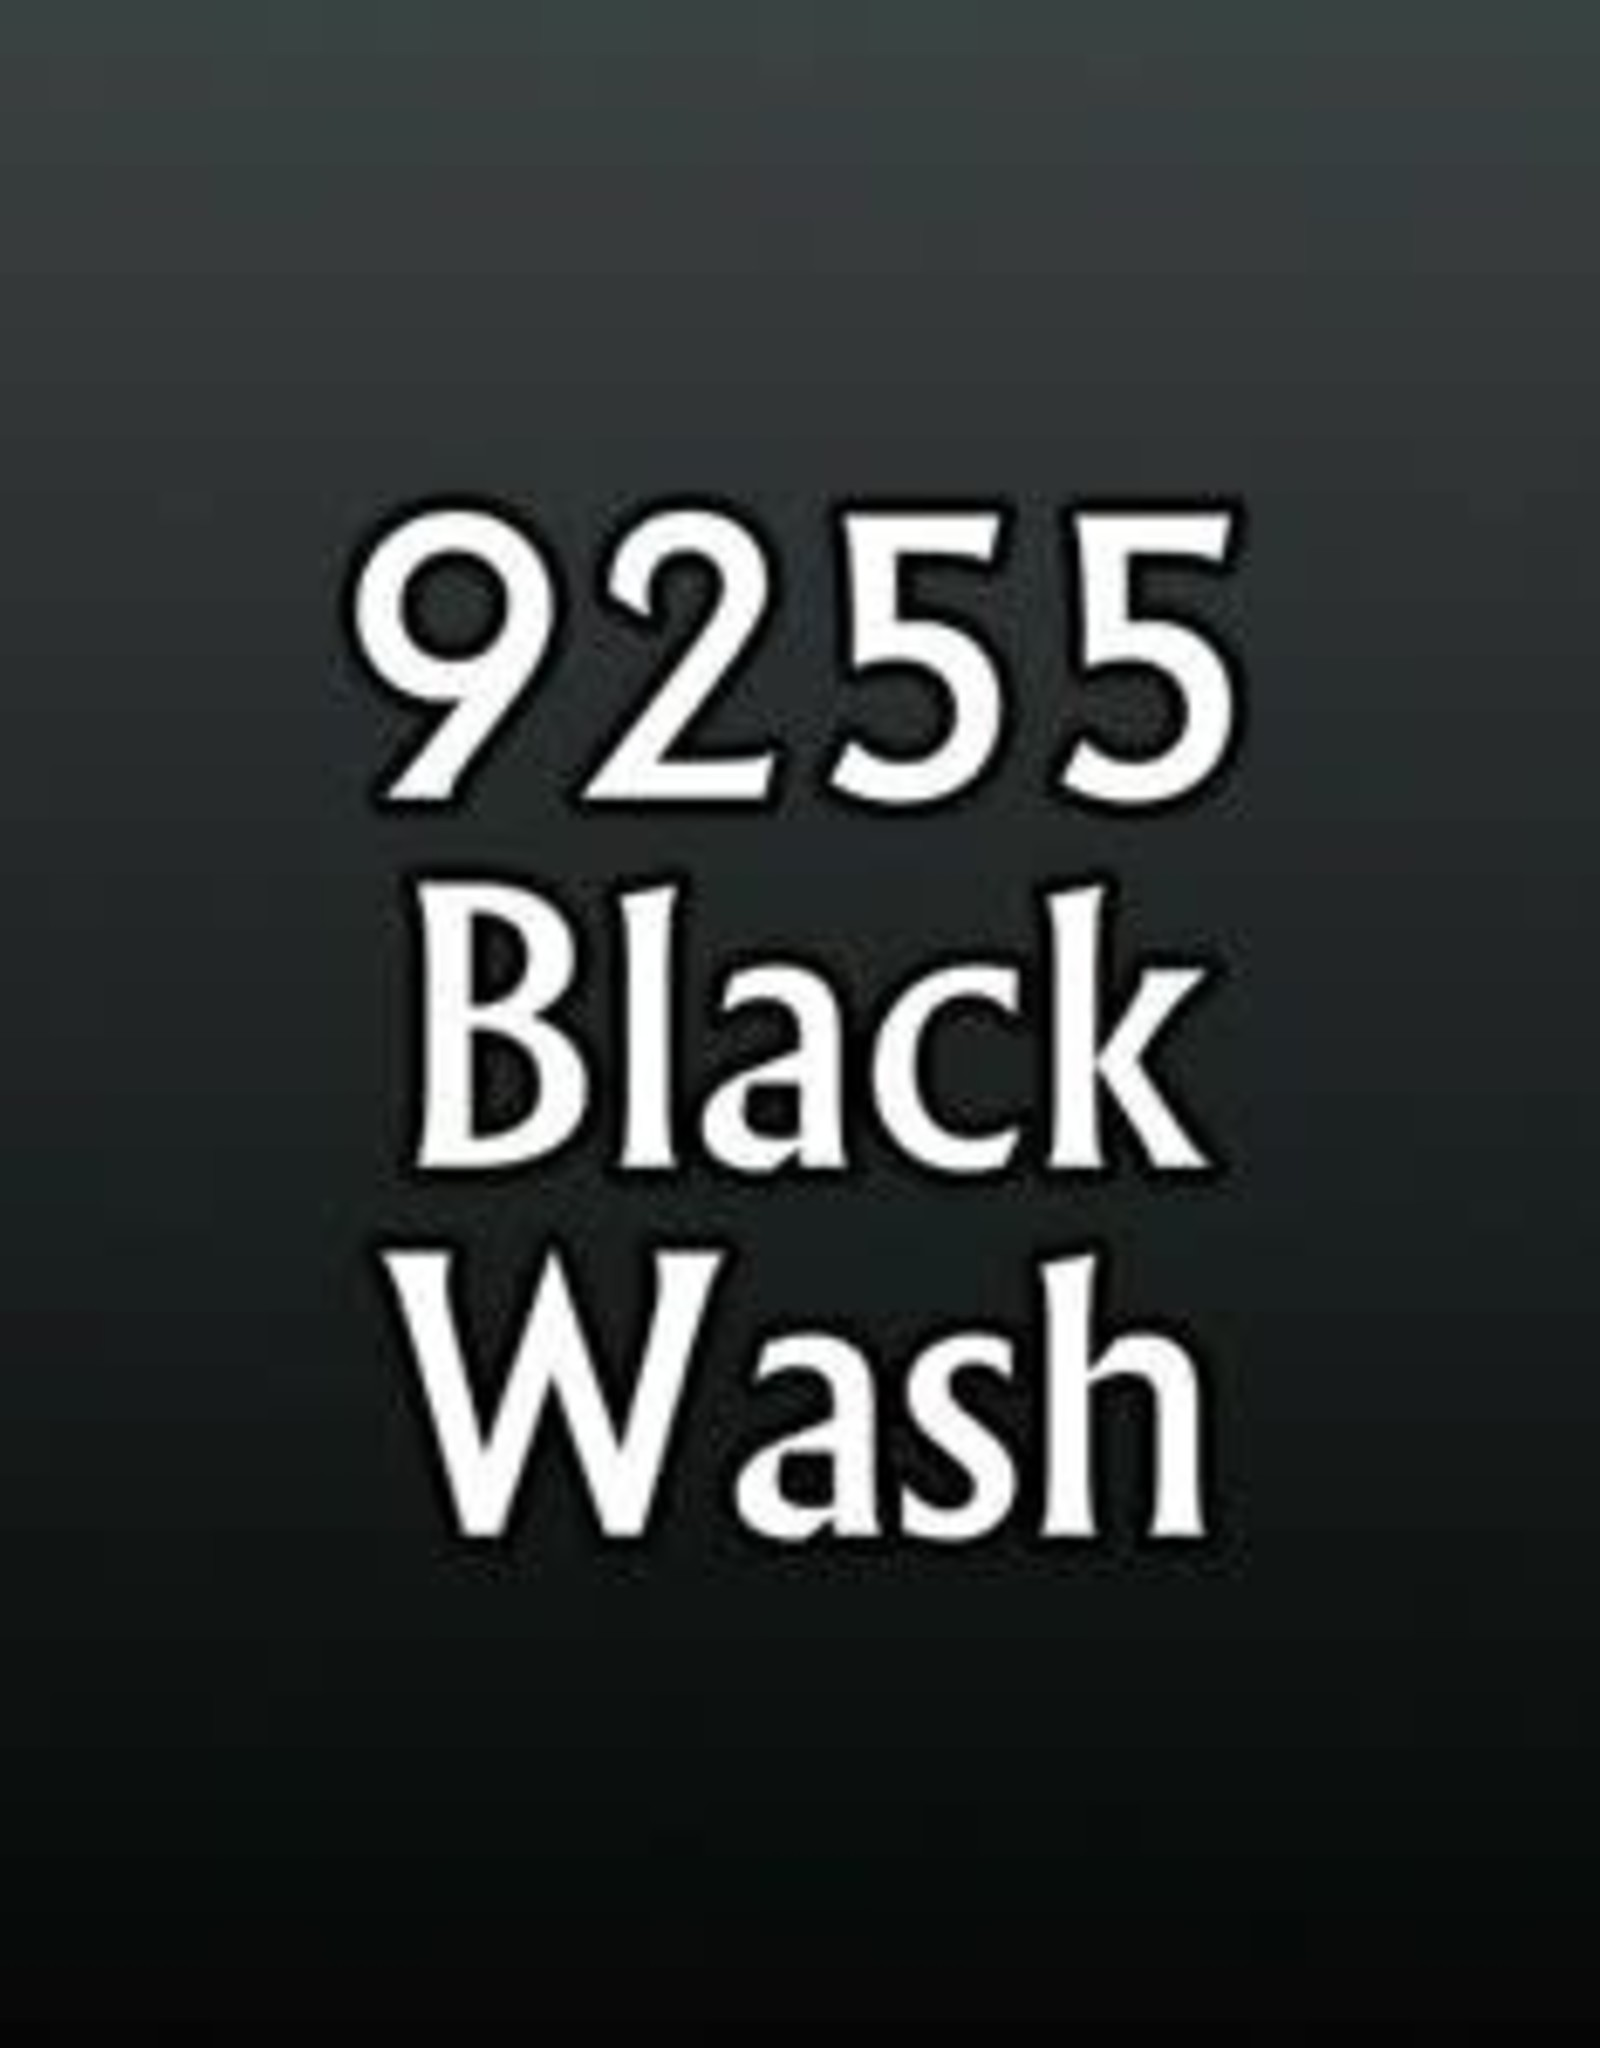 Reaper Black Wash